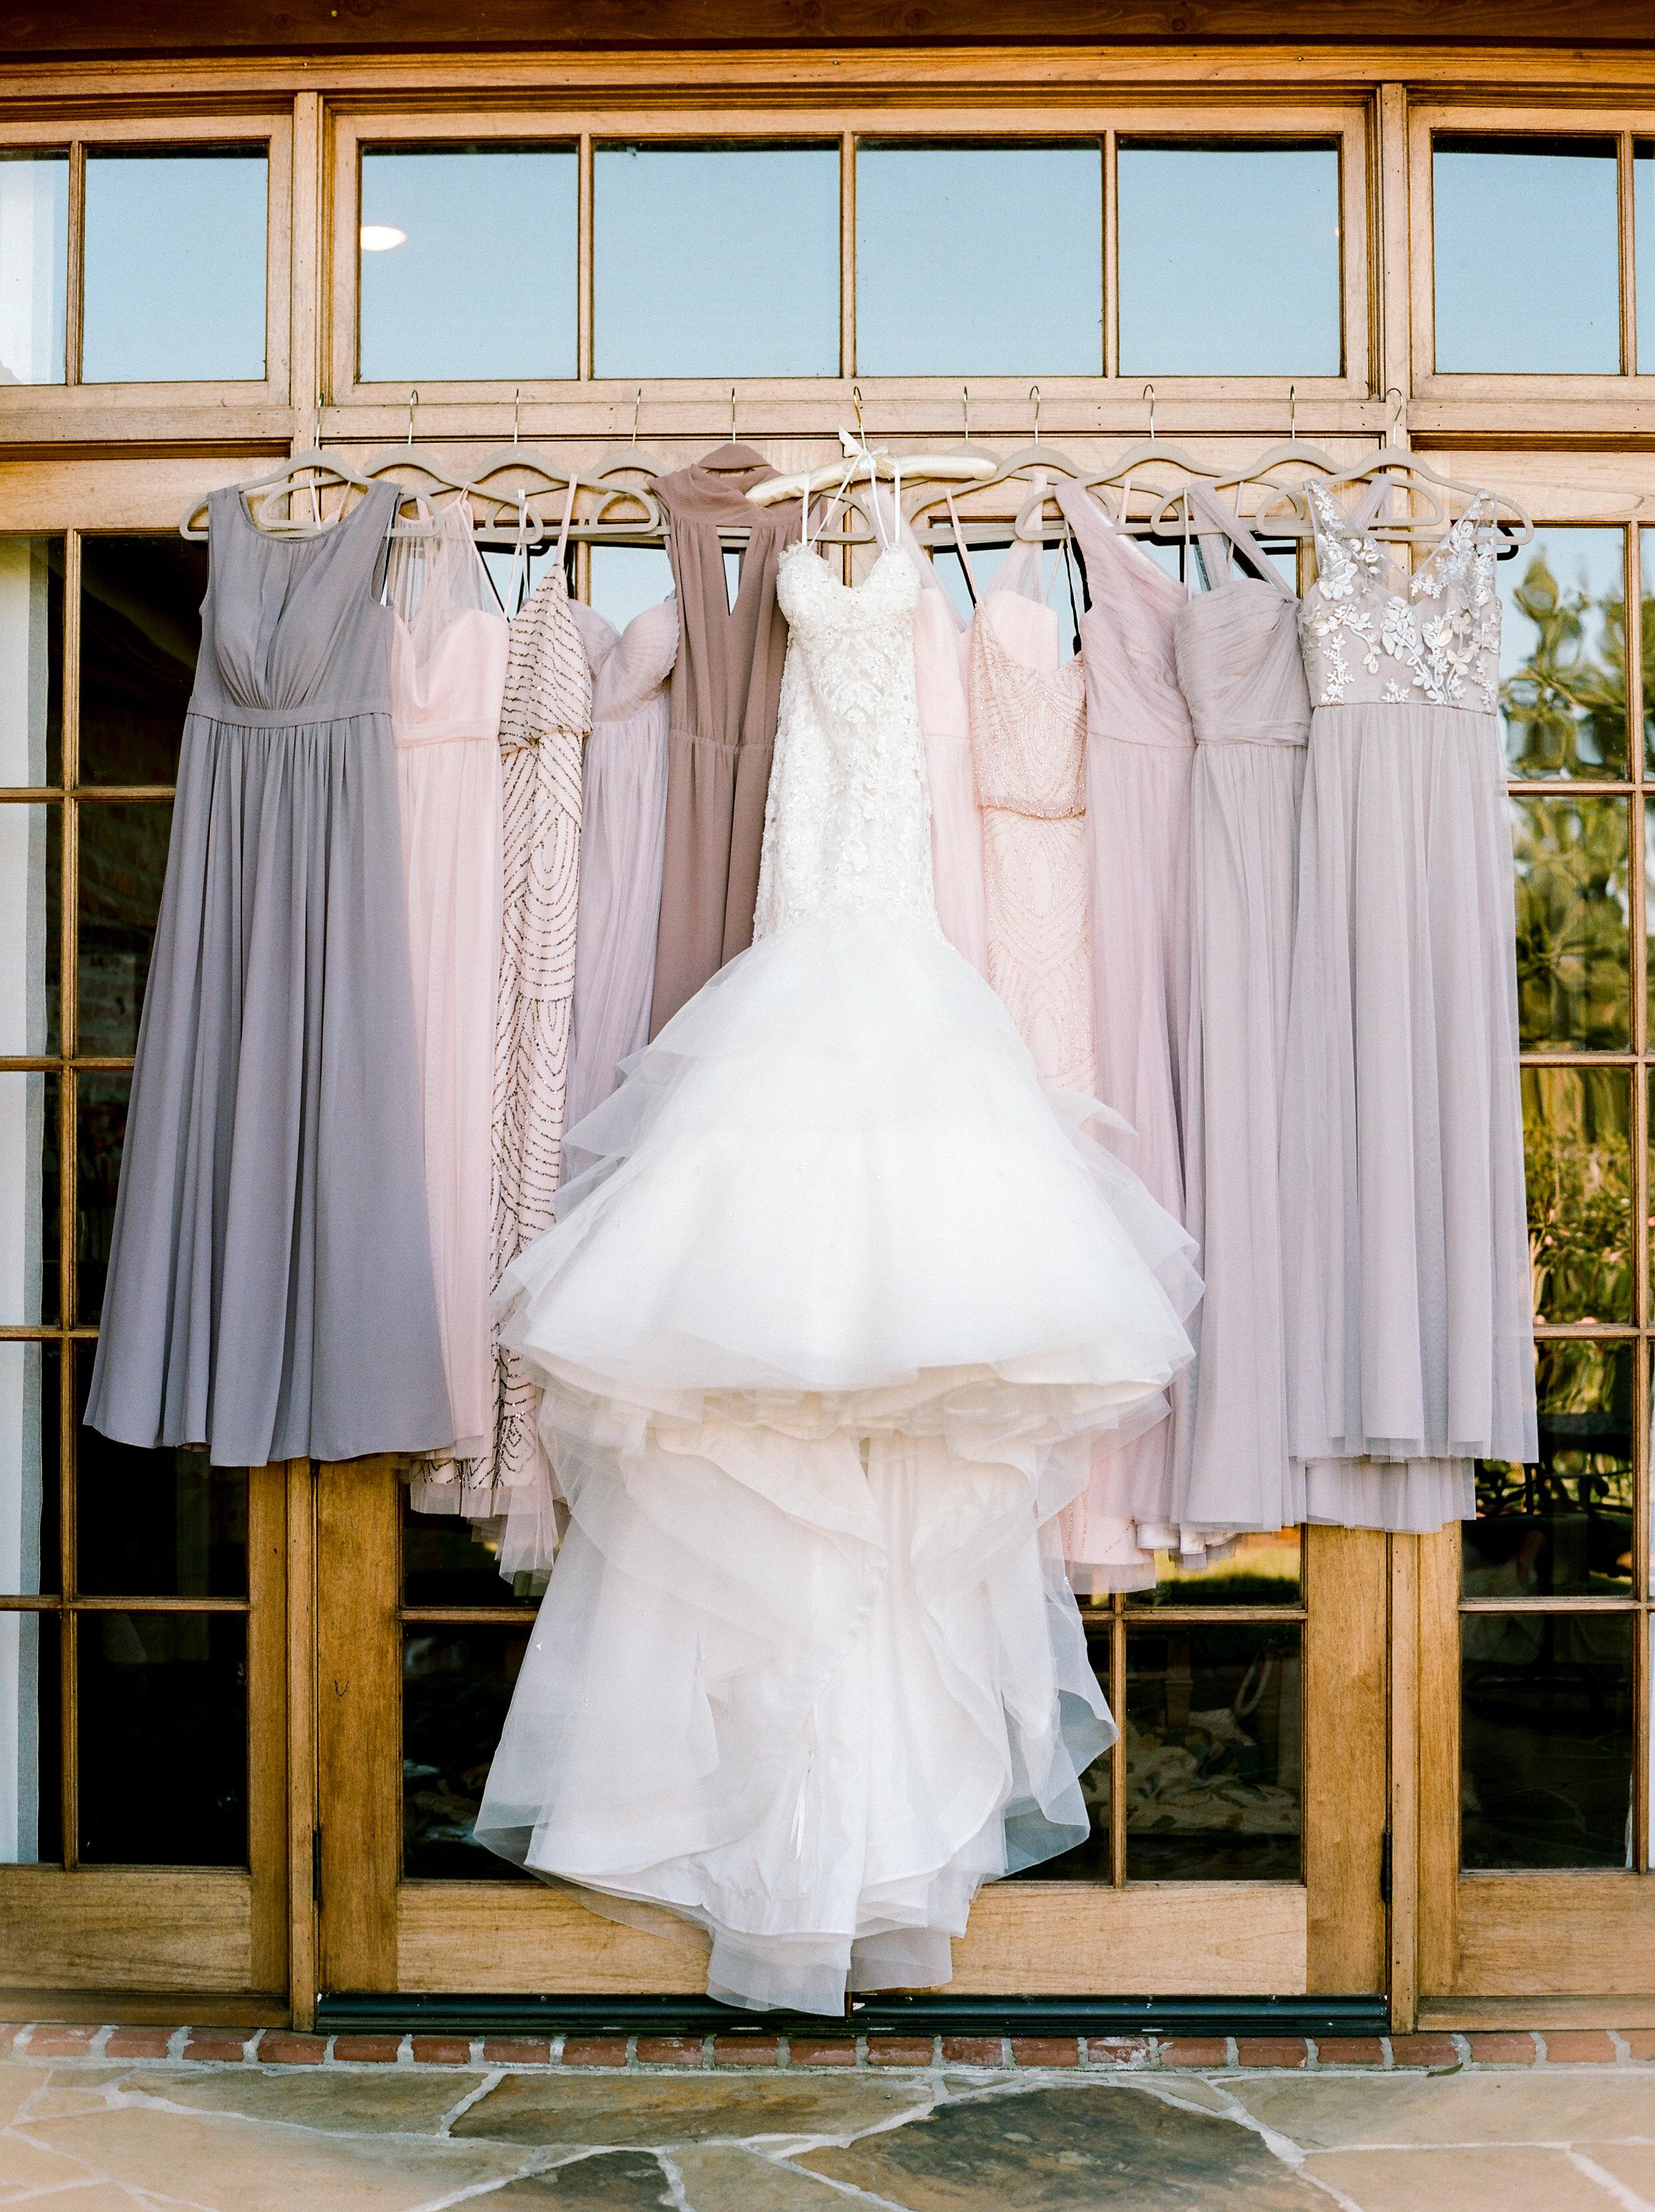 Southern Fete, Southern Wedding, Bride's Dress, Bridesmaids dresses